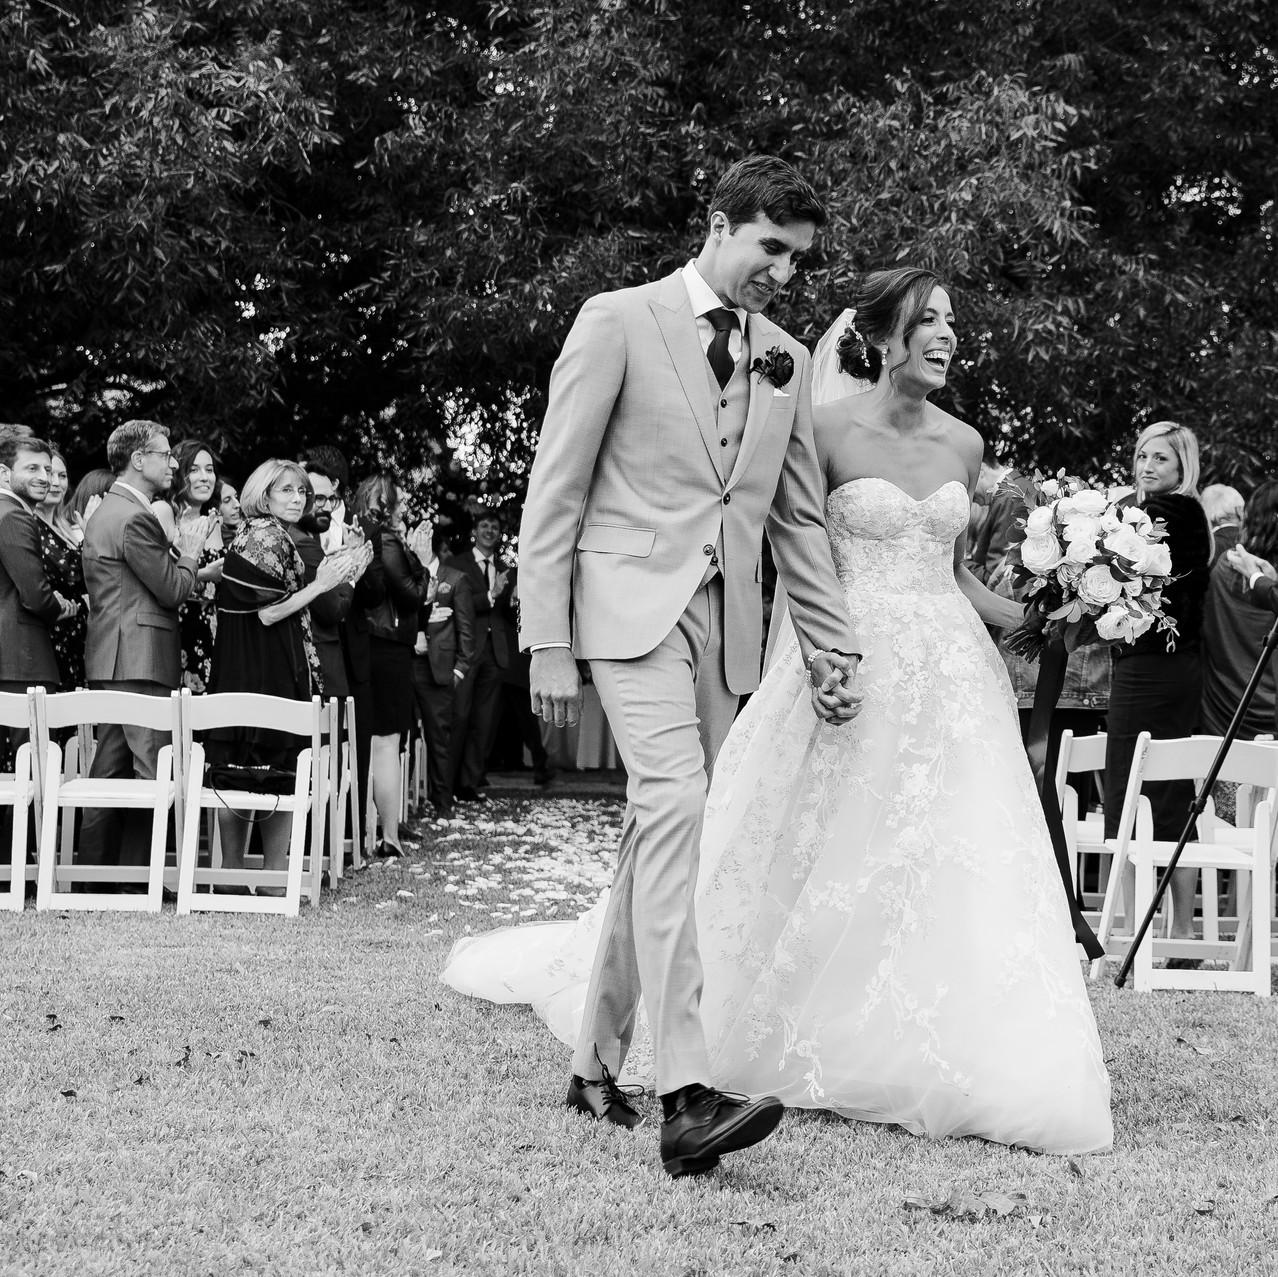 45-Ozer-Gati Wedding-Barr Mansion Jewish